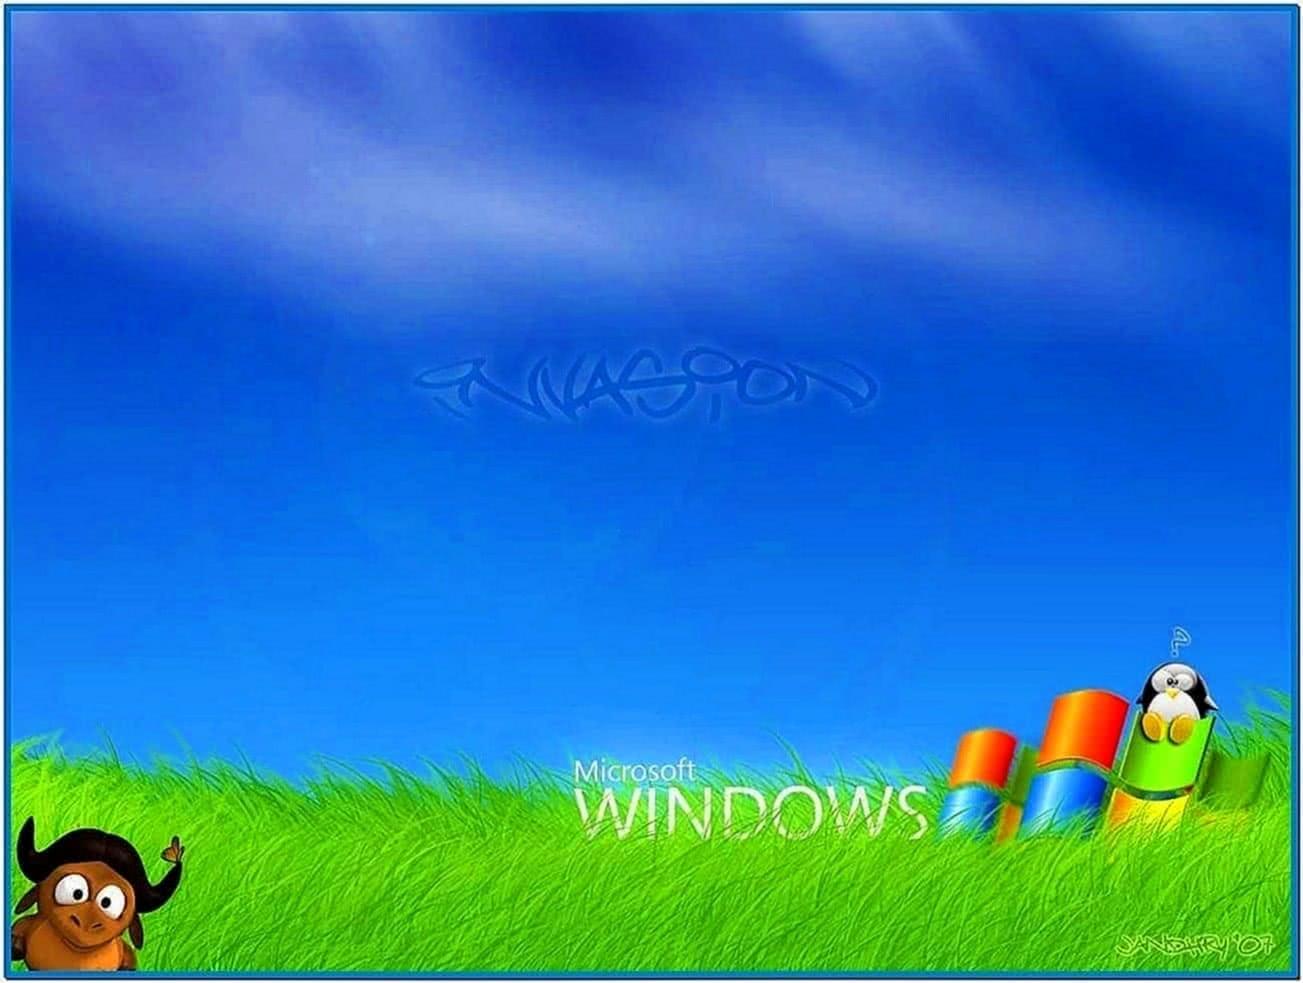 New Screensavers Vista